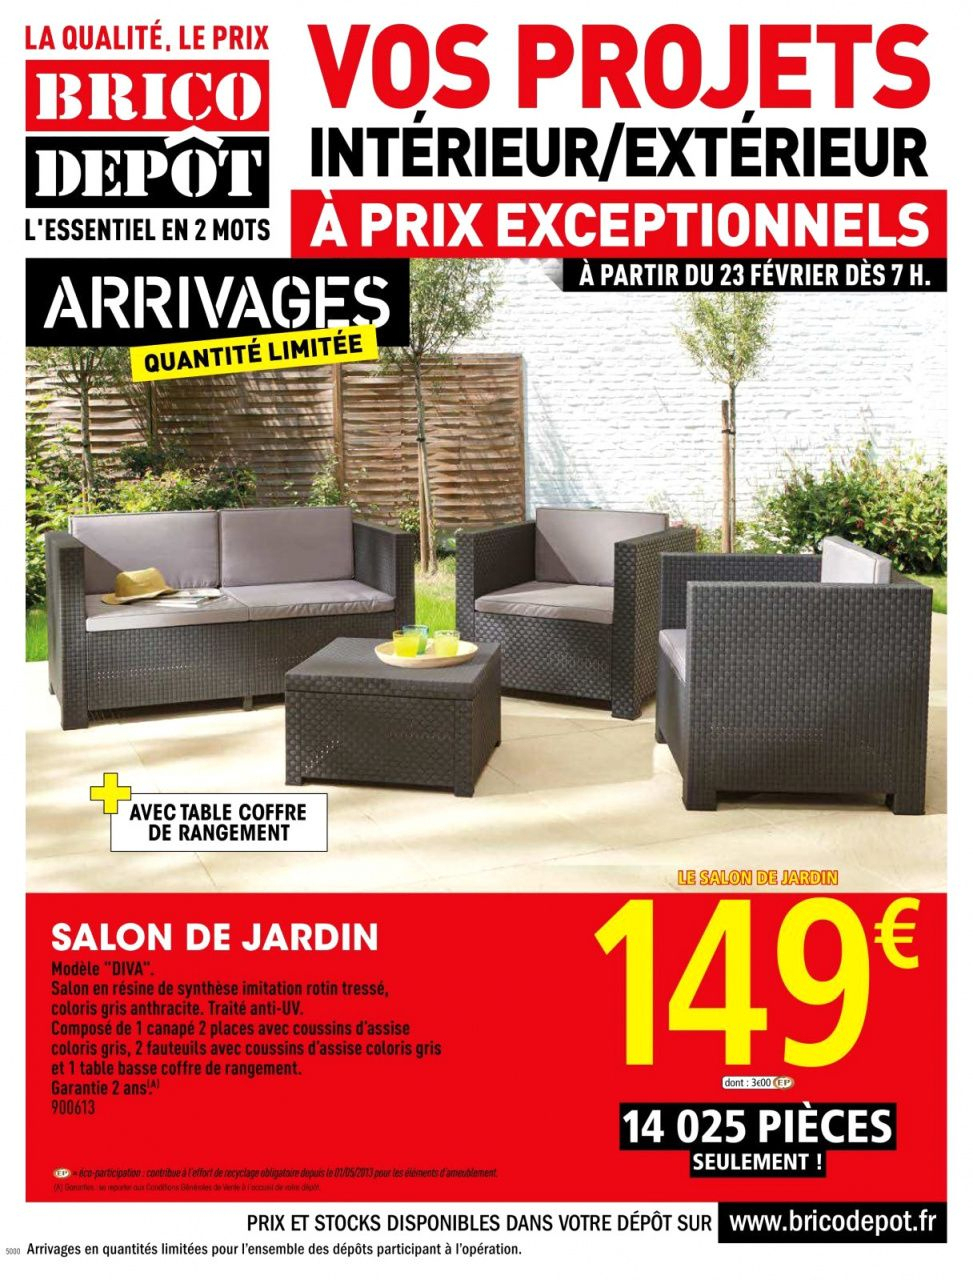 Table De Jardin Brico Depot - Canalcncarauca avec Brico Depot Abris De Jardin